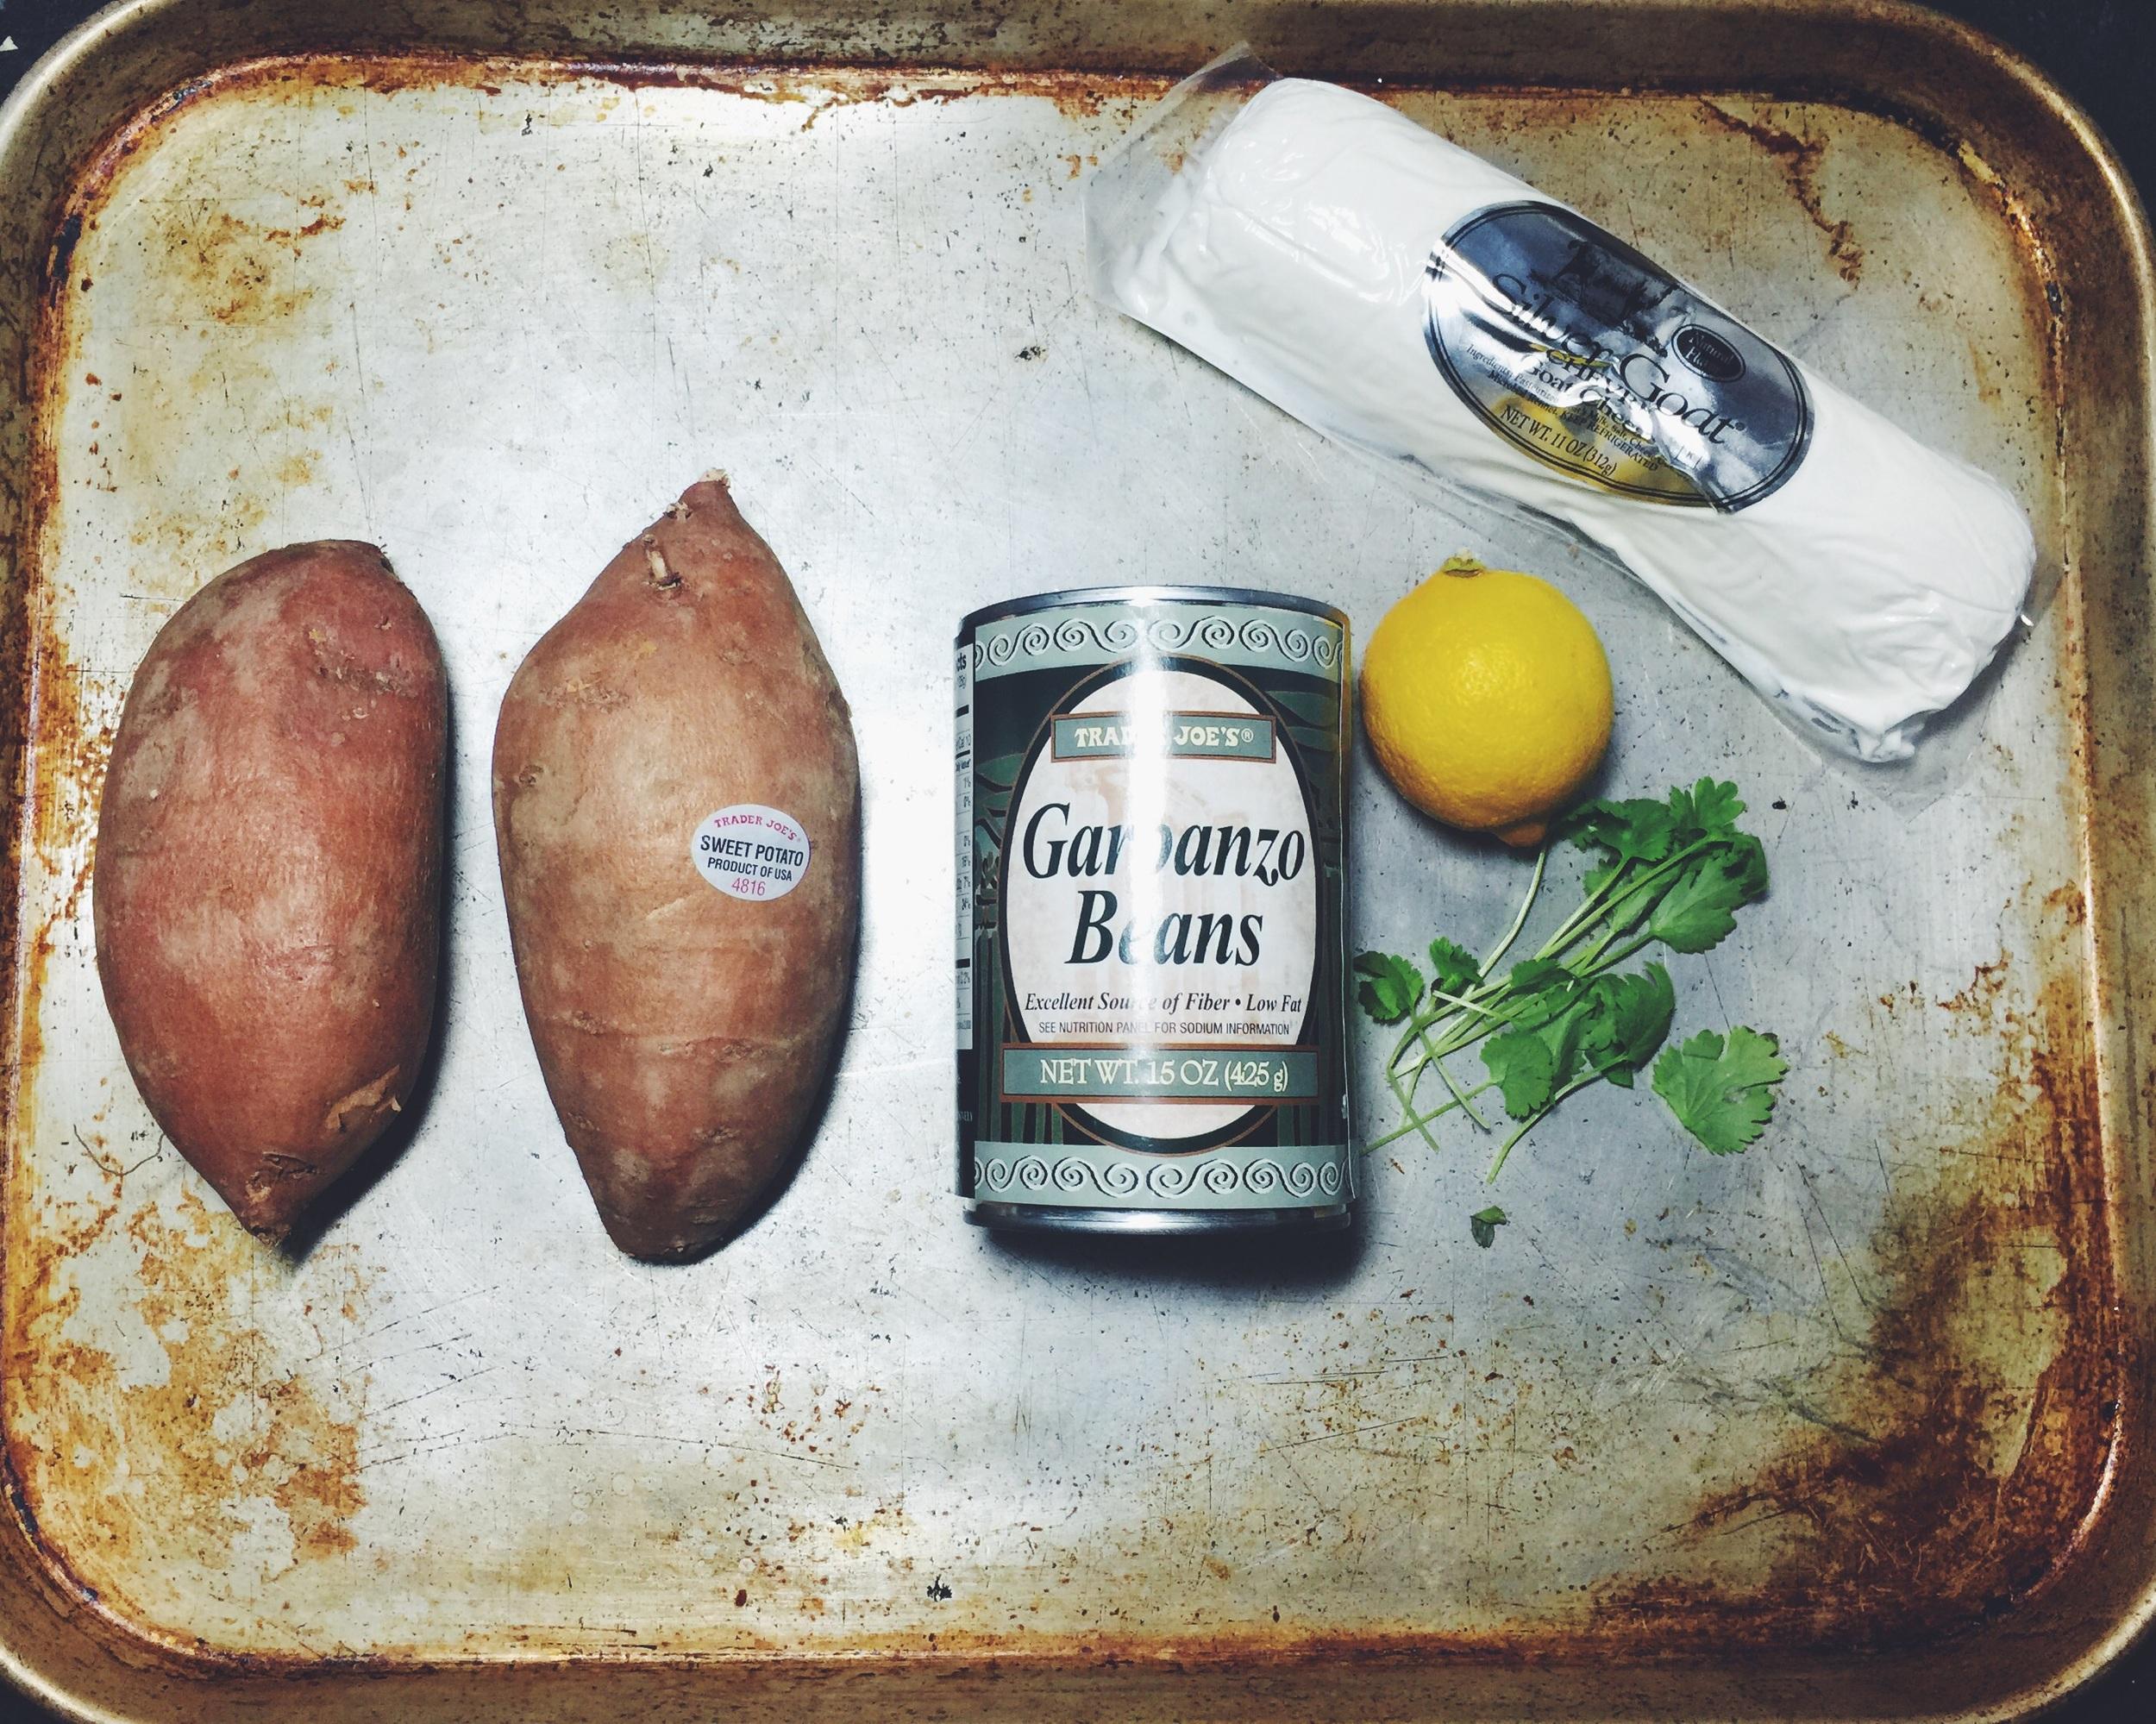 sweet potato, chickpeas, goat cheese, cilantro, and lemon